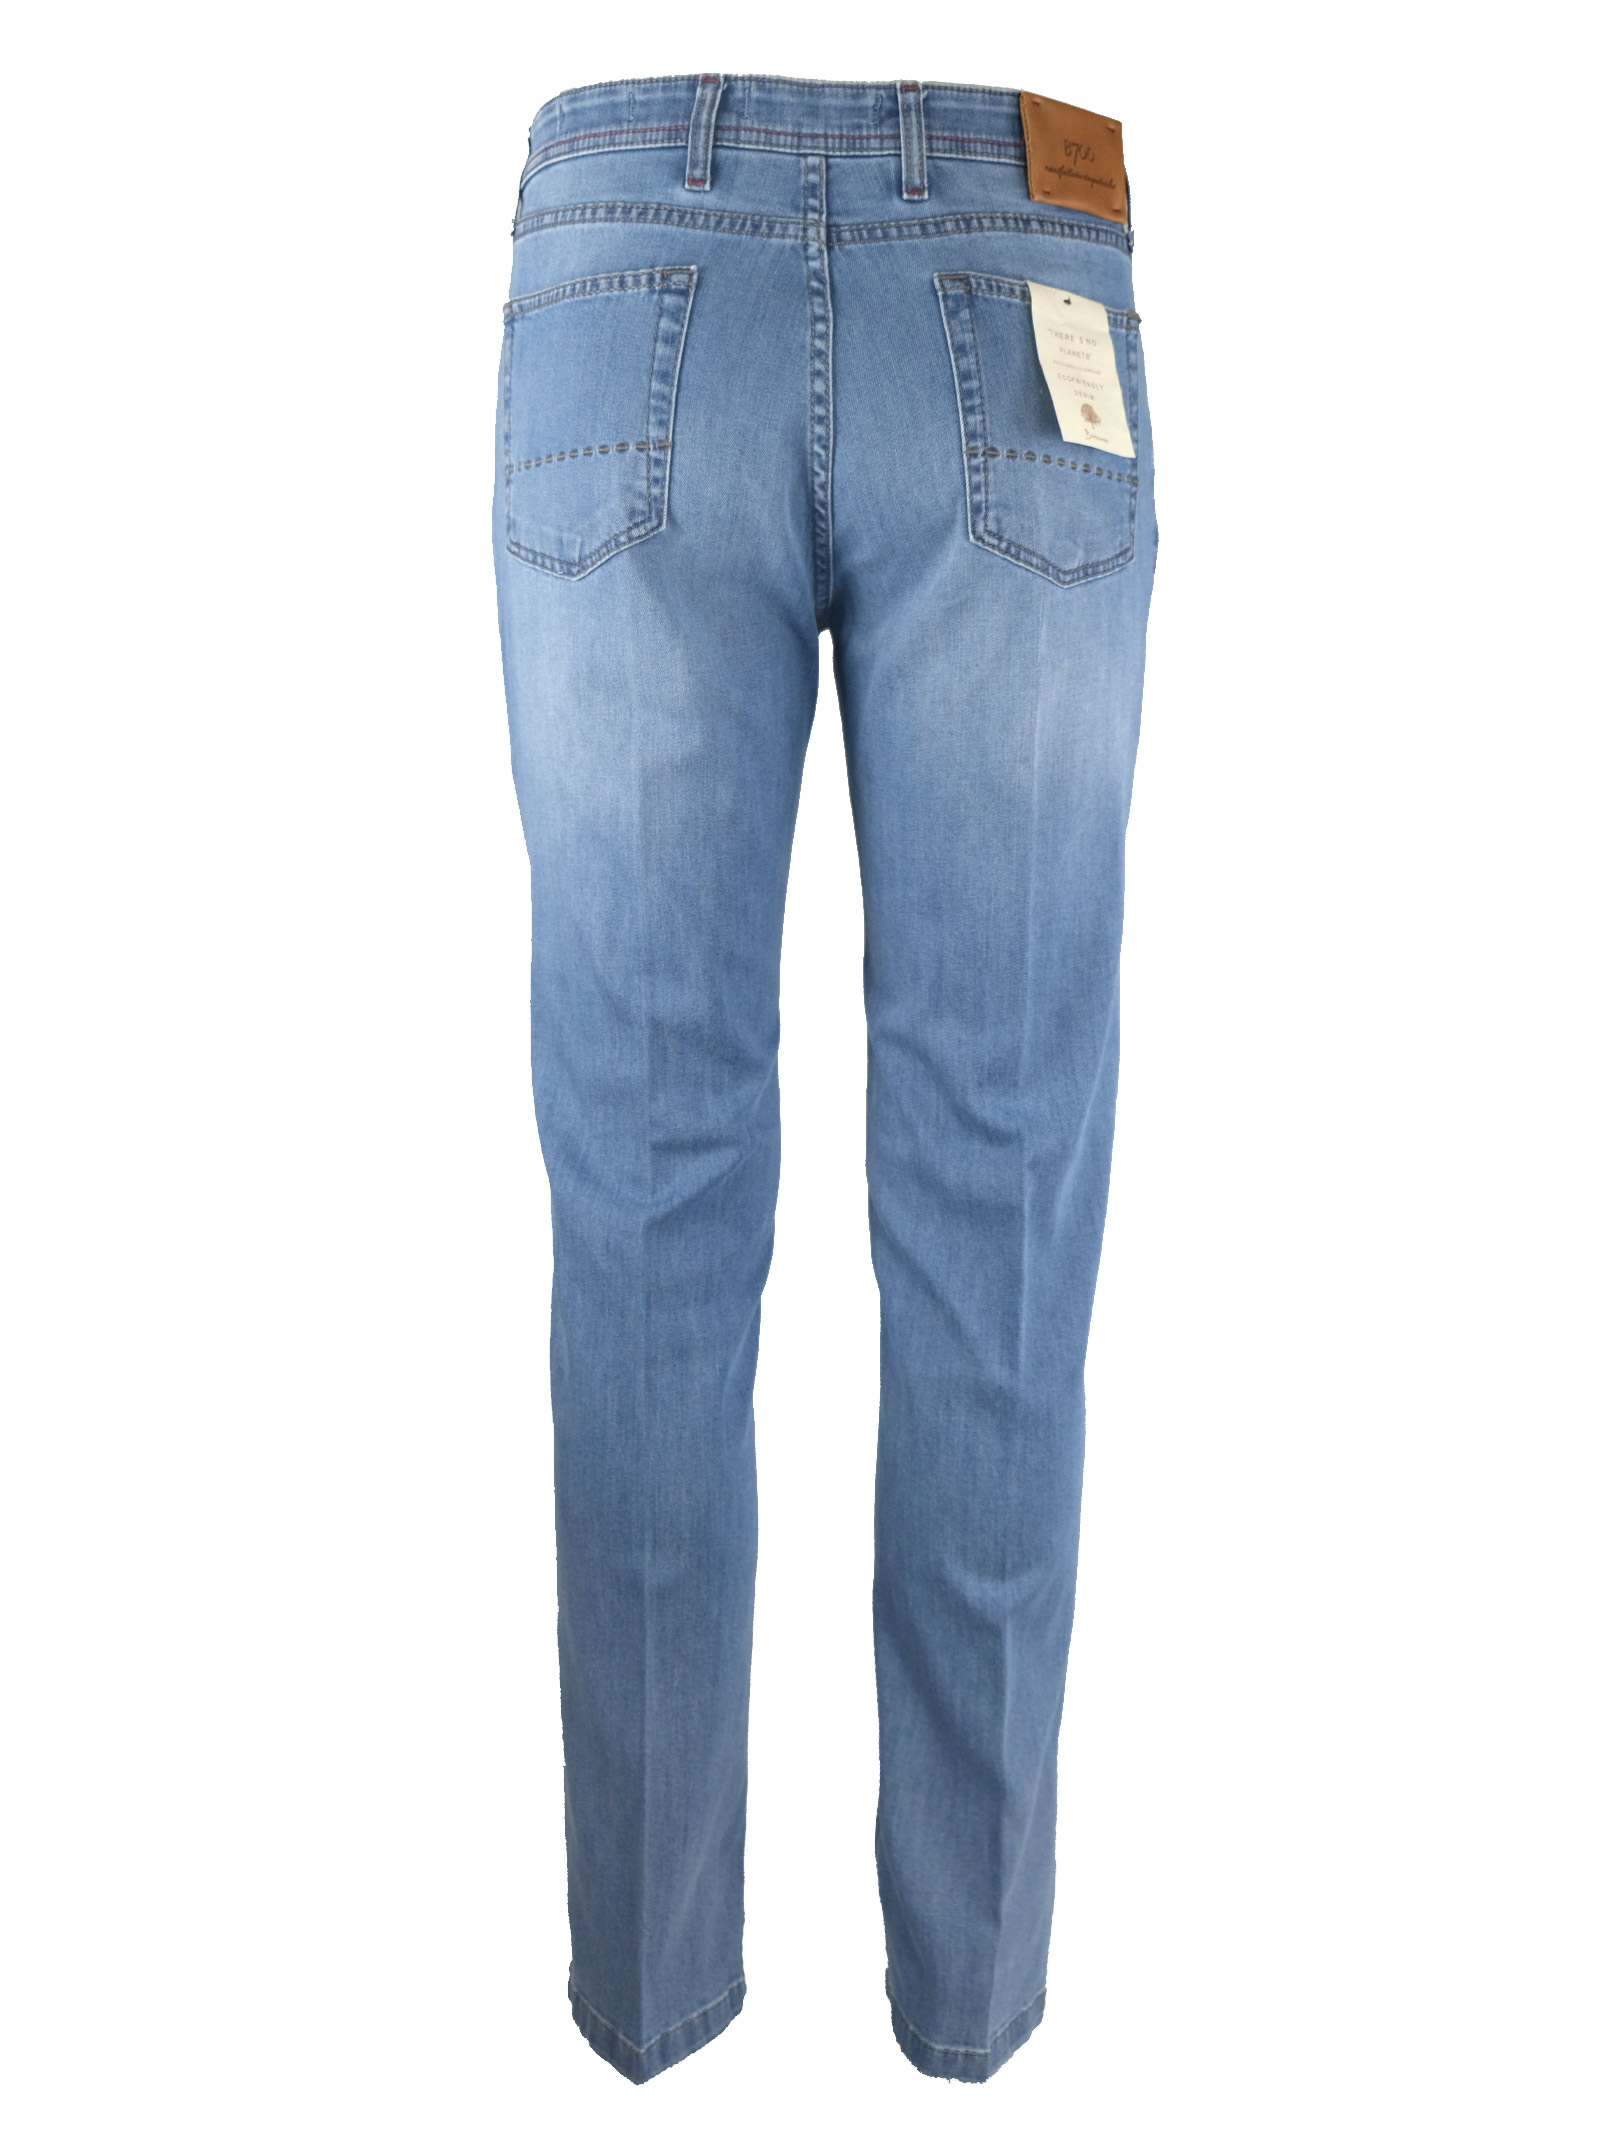 8  OZ. LIGHT DENIM JEANS B700 | Jeans | JR704 9026106